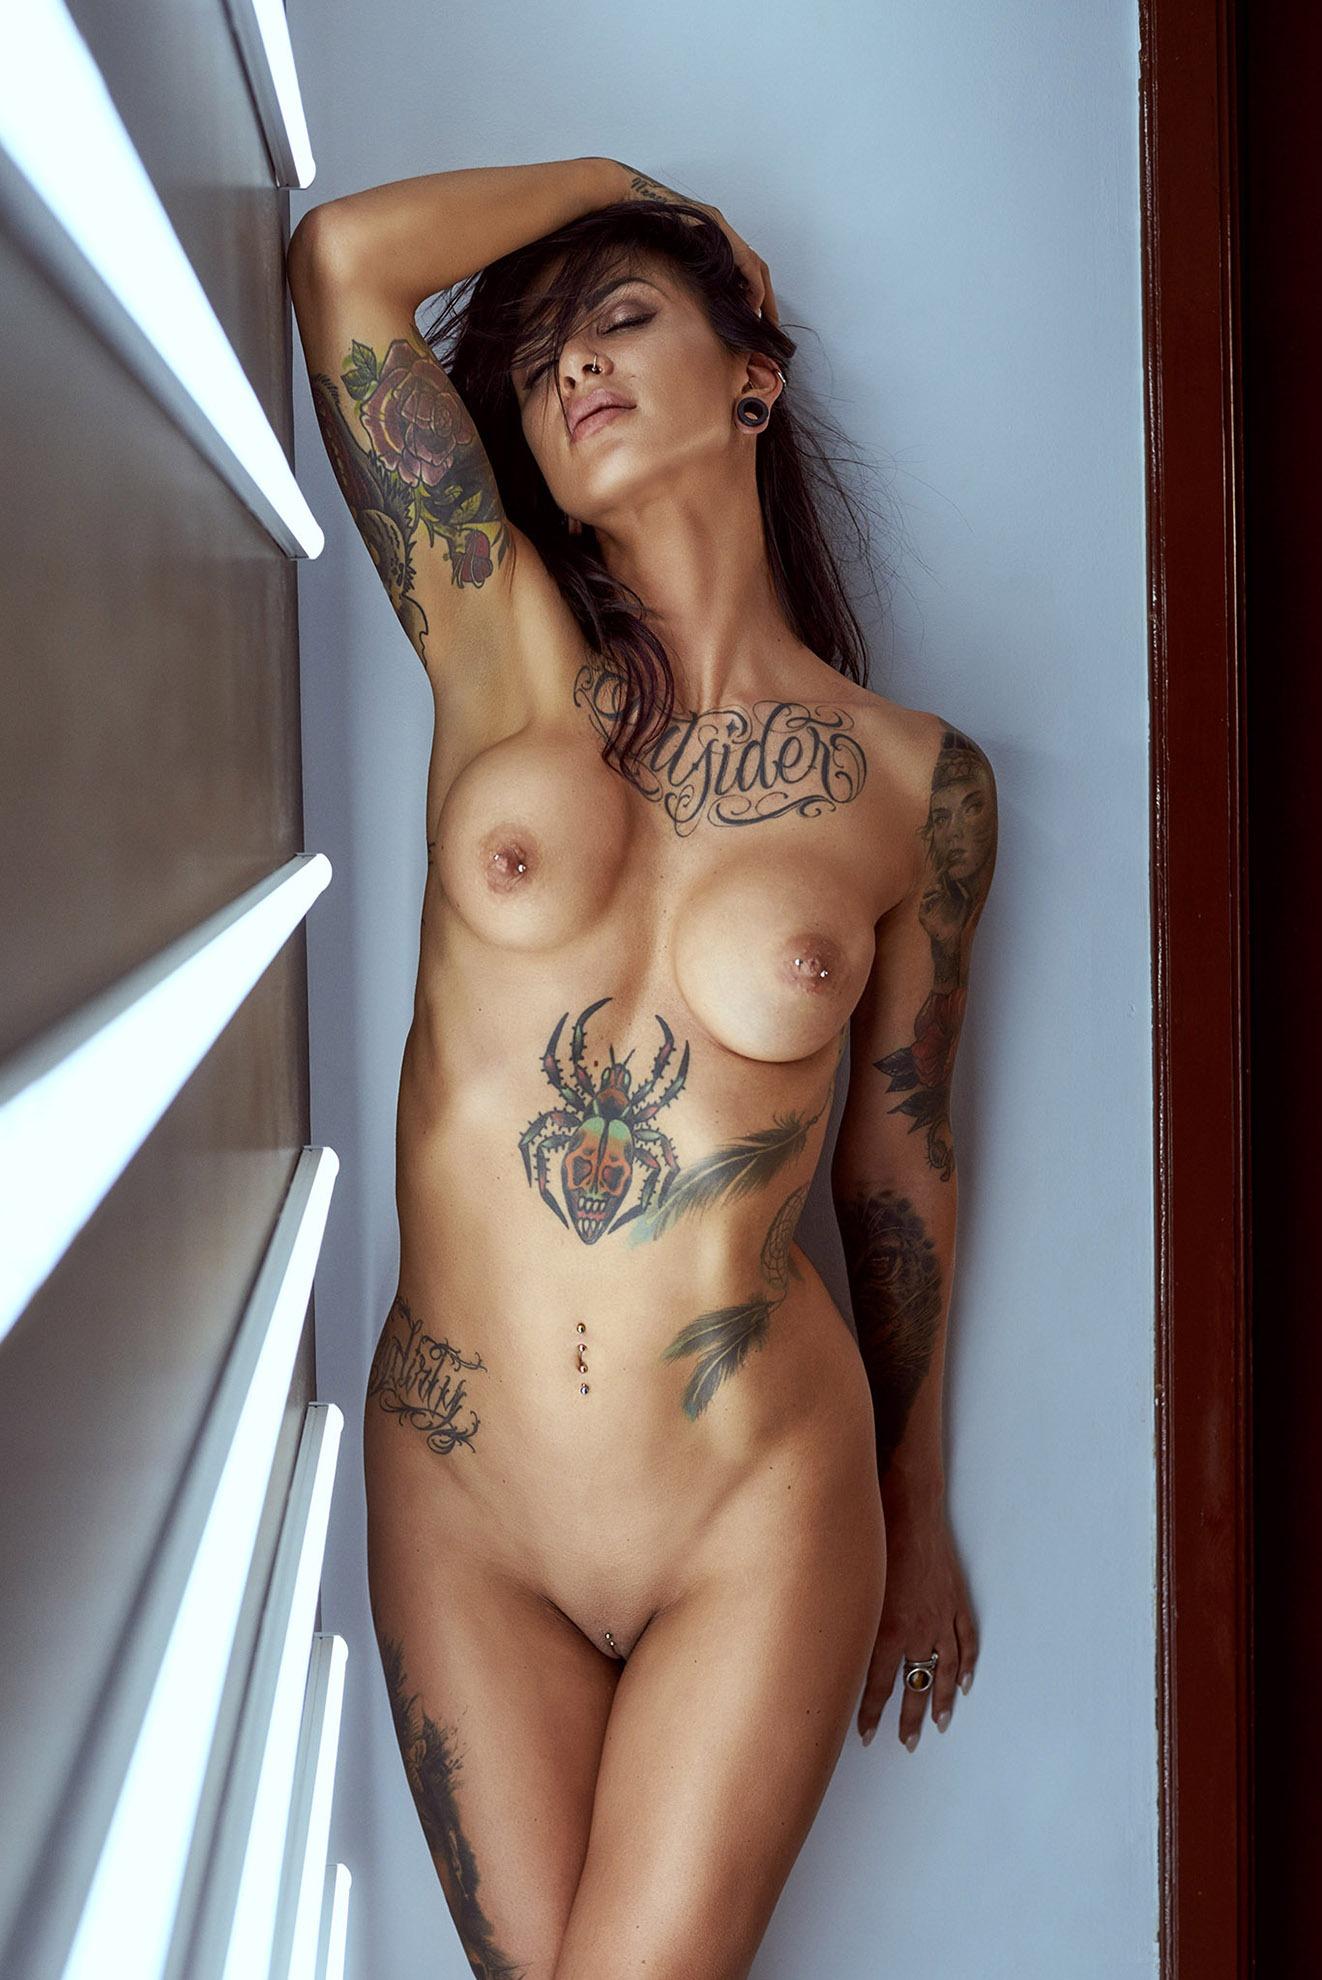 nude; photography; nude; sedinta foto boudoir; boudoir; shooting; sedinta foto; model; erotic; sexy; sensual; booty; lingerie; lenjerie; fotograf profesionist; fetish; retouch; dark; fotograf nud; fotograf profesionist nud; sedinta foto sexy; sedinta nud; boudoir nud; model; retouch; alternative model, tattoo